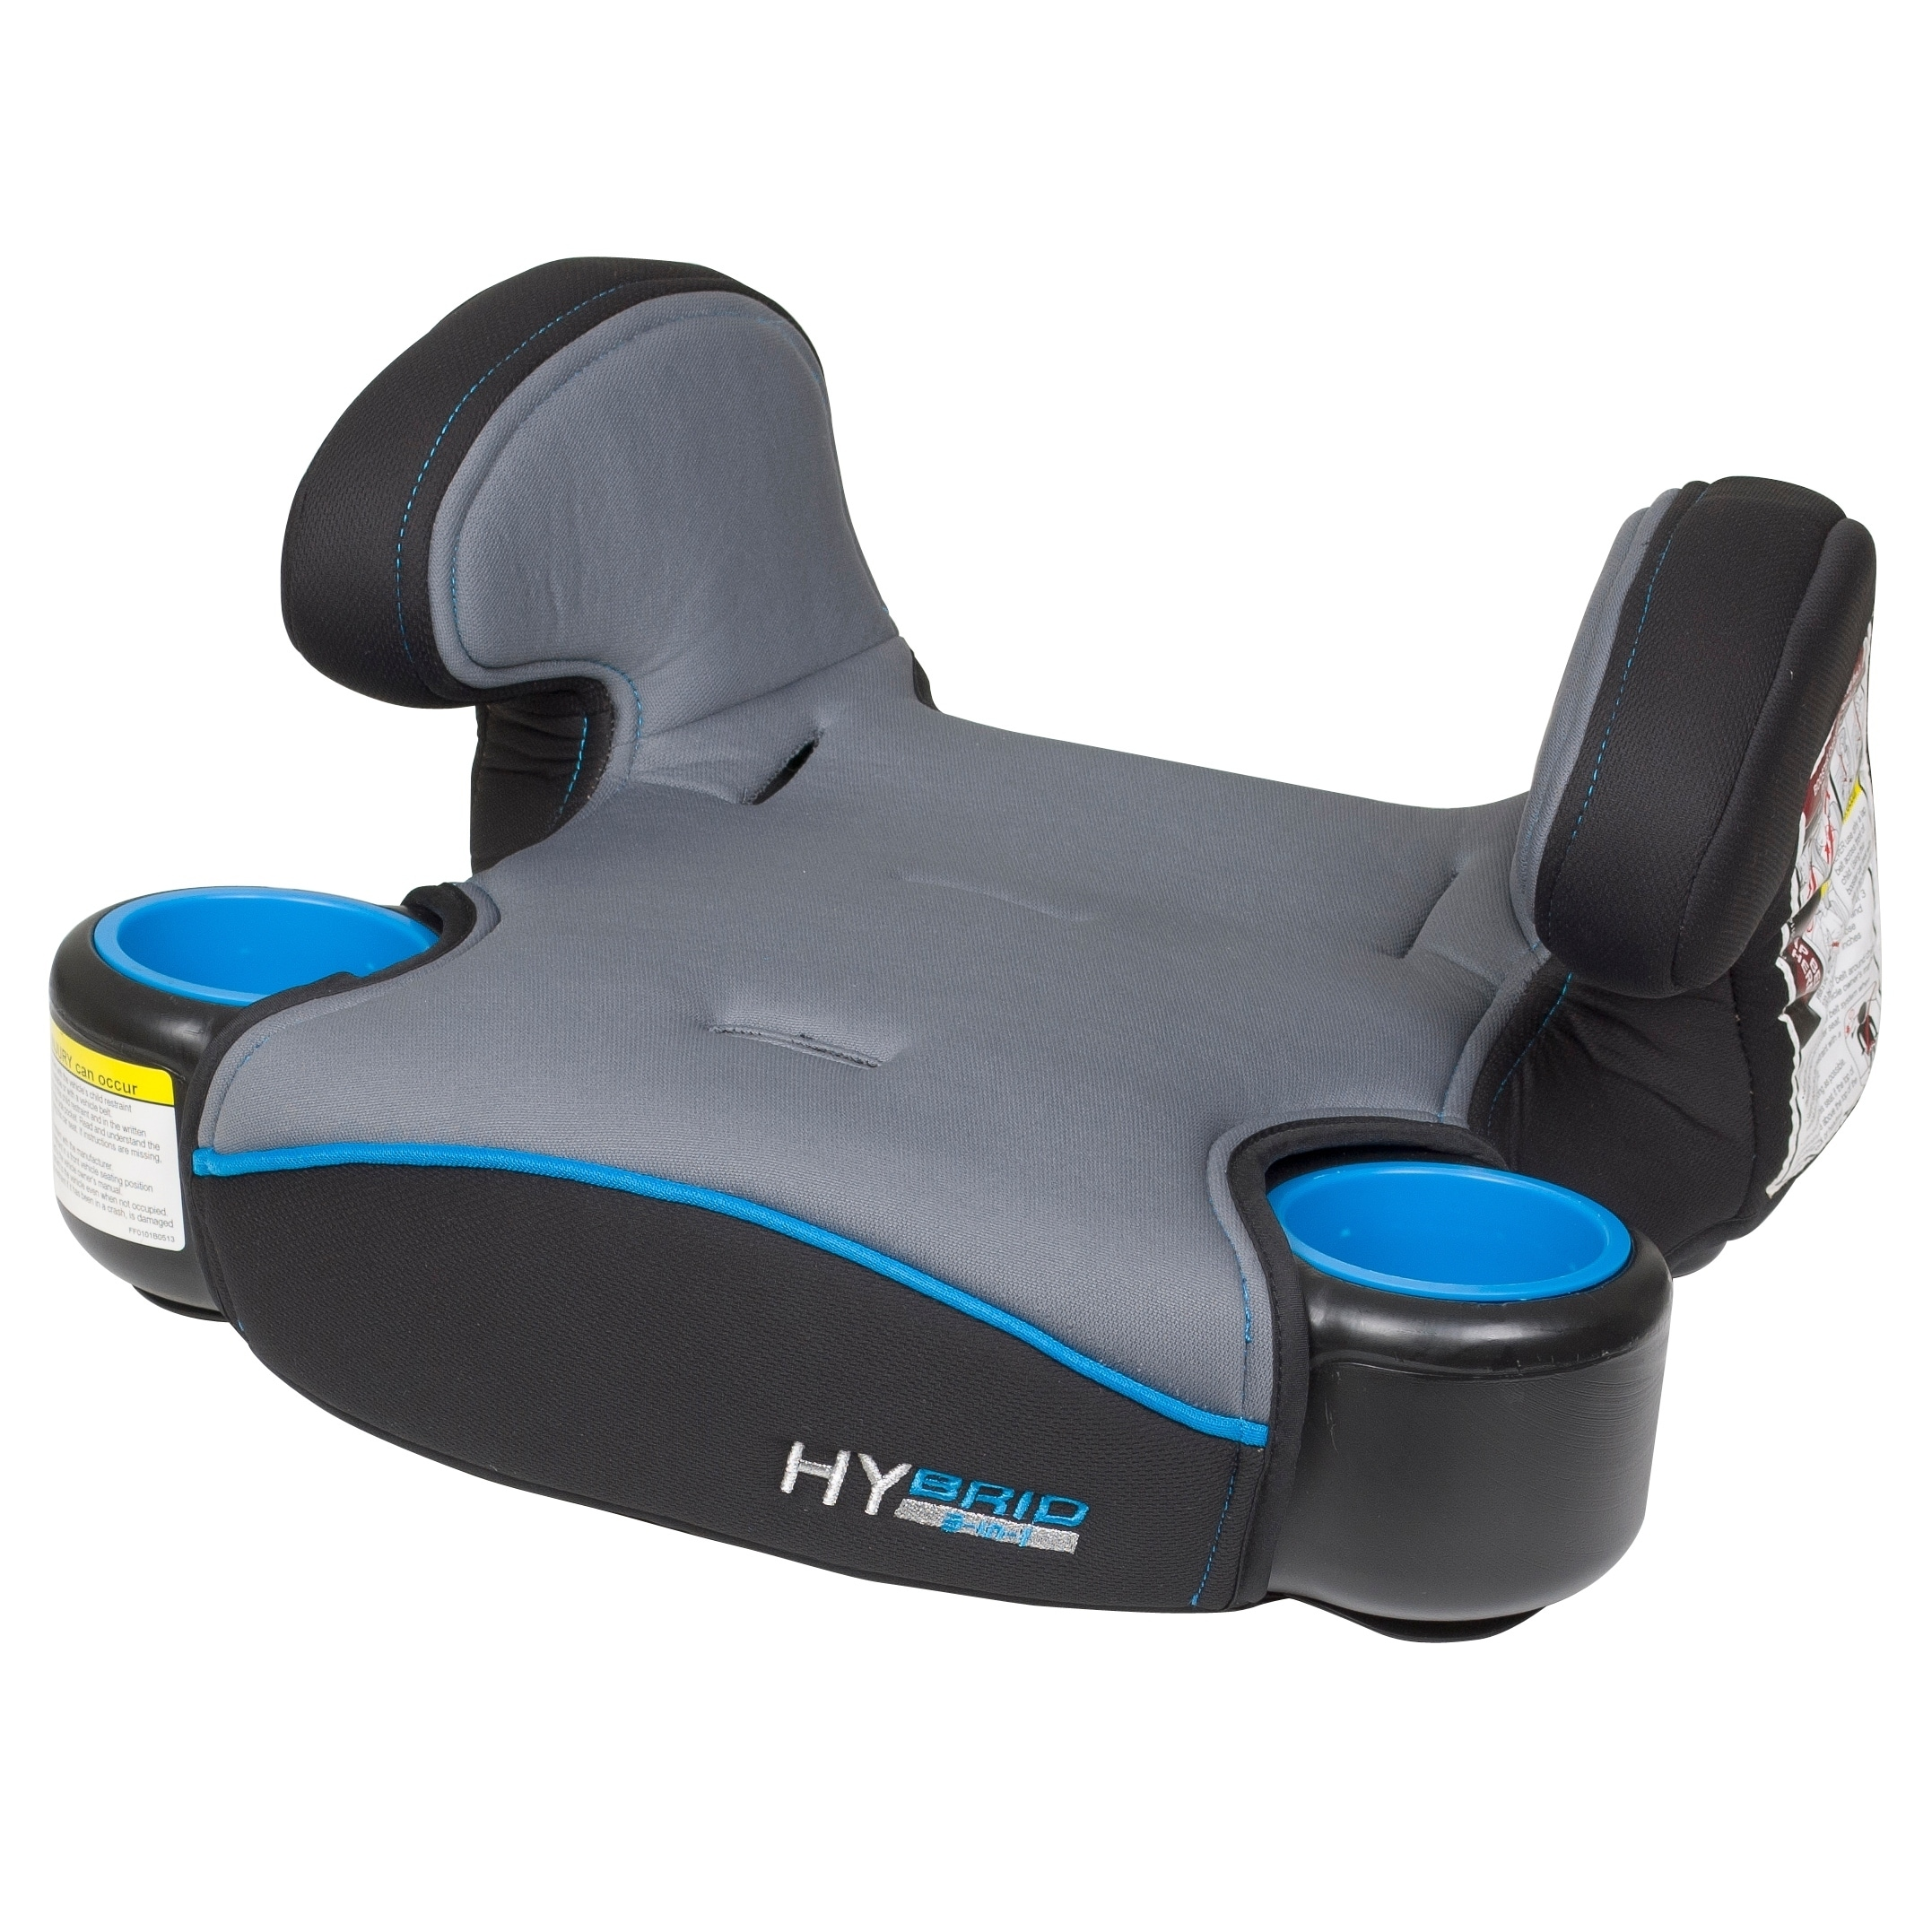 Shop Baby Trend Hybrid 3 In 1 Car SeatOzone